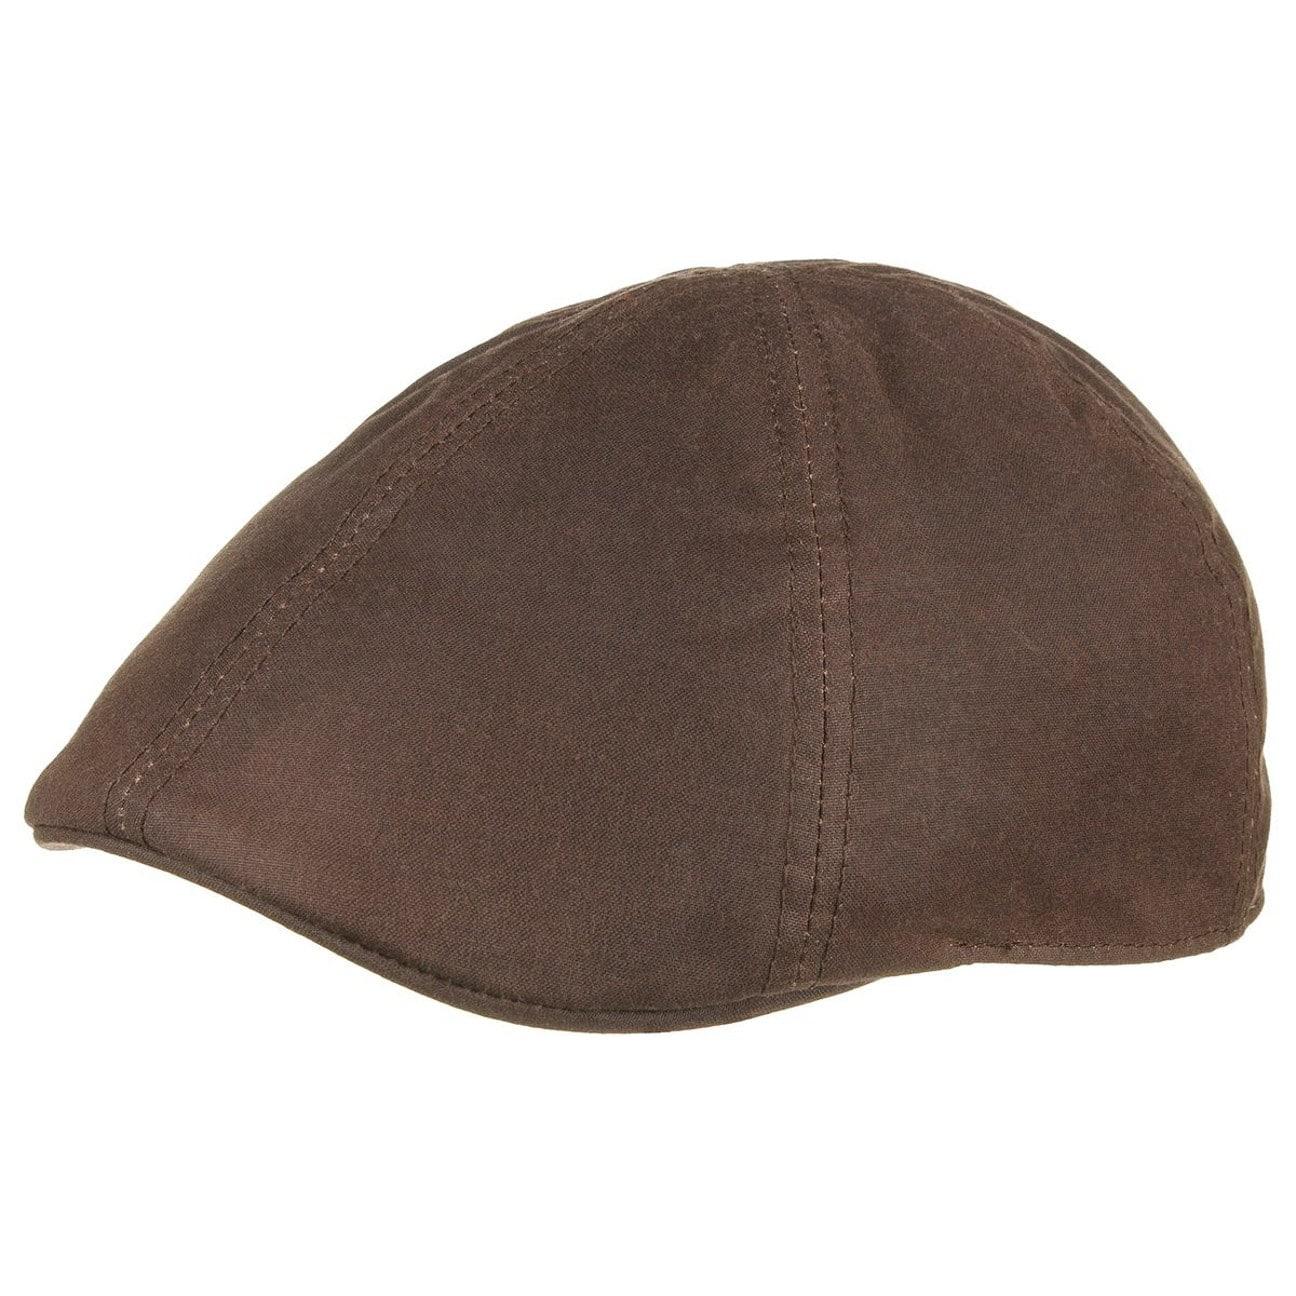 texas-waxed-cotton-gatsby-cap-by-stetson-herrenmutze